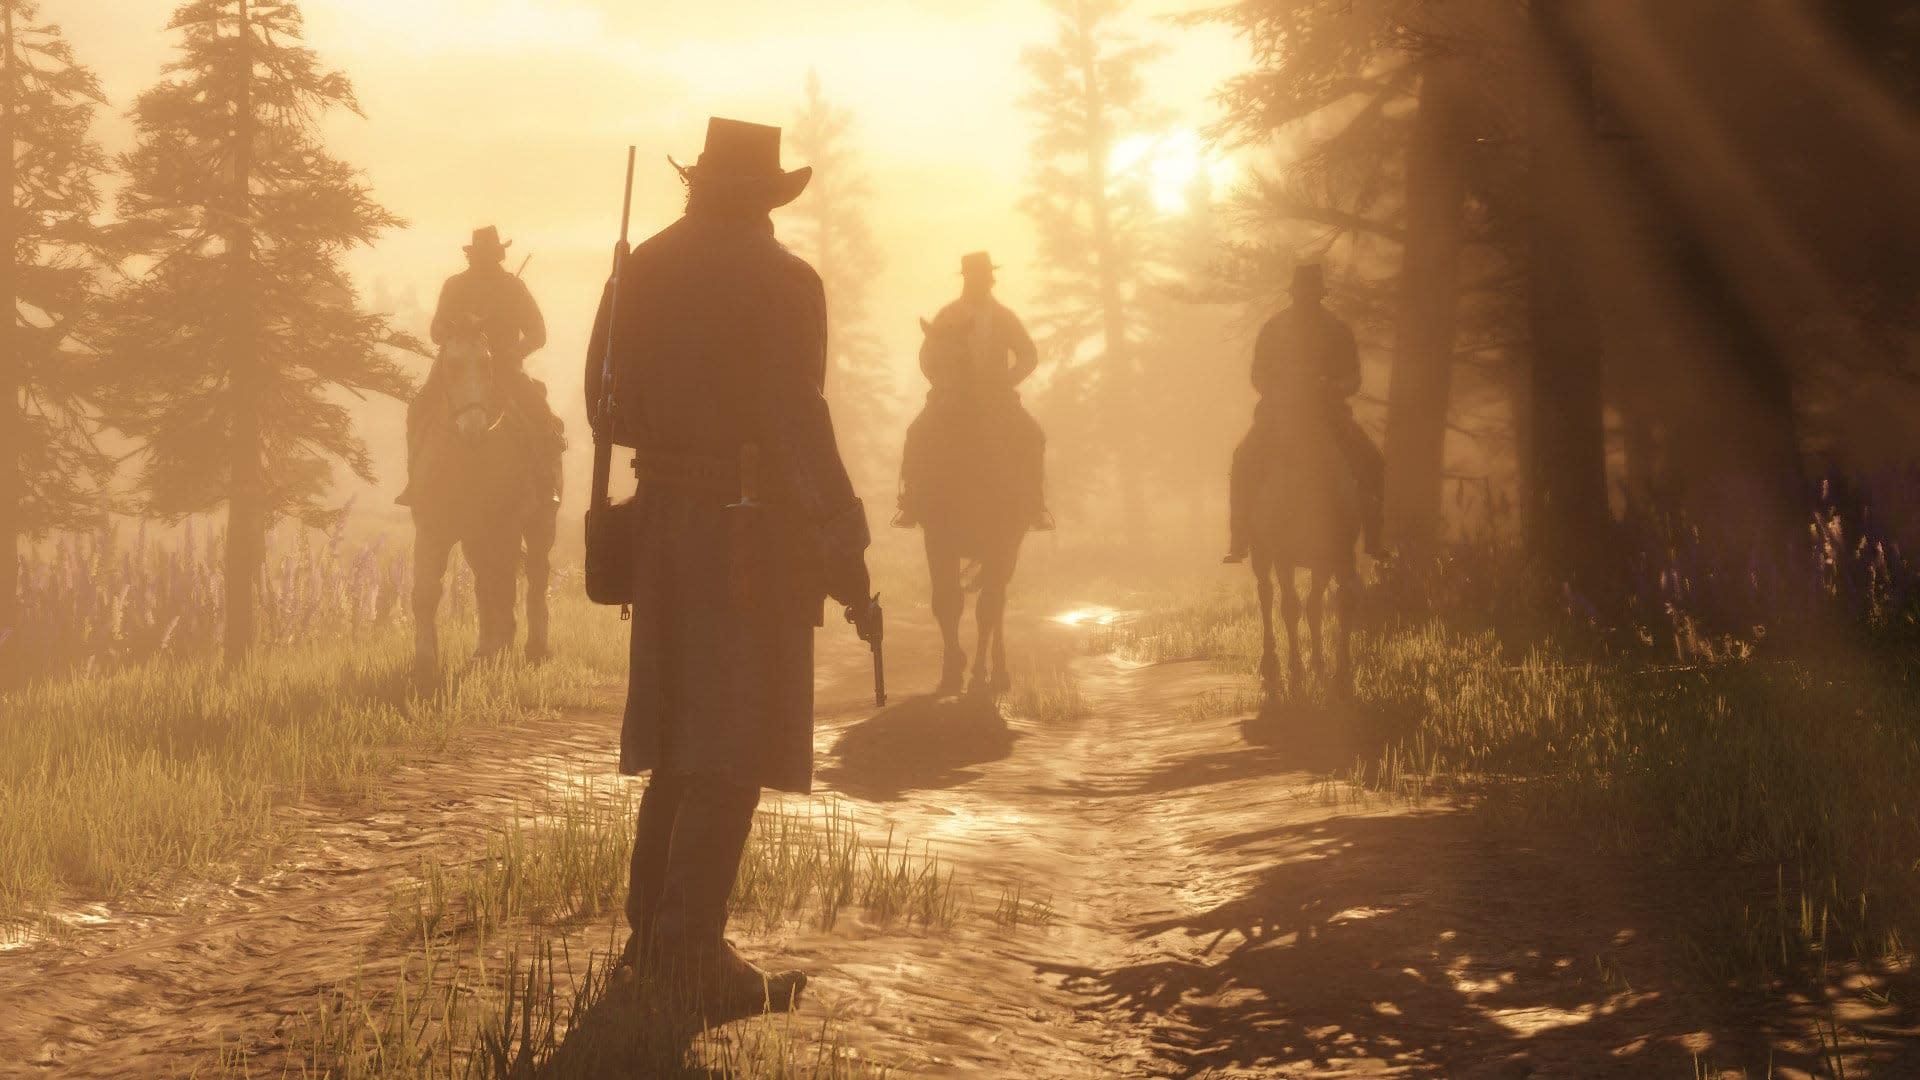 Red Dead Redemption 2 Illustration Hd Games 4k Wallpapers